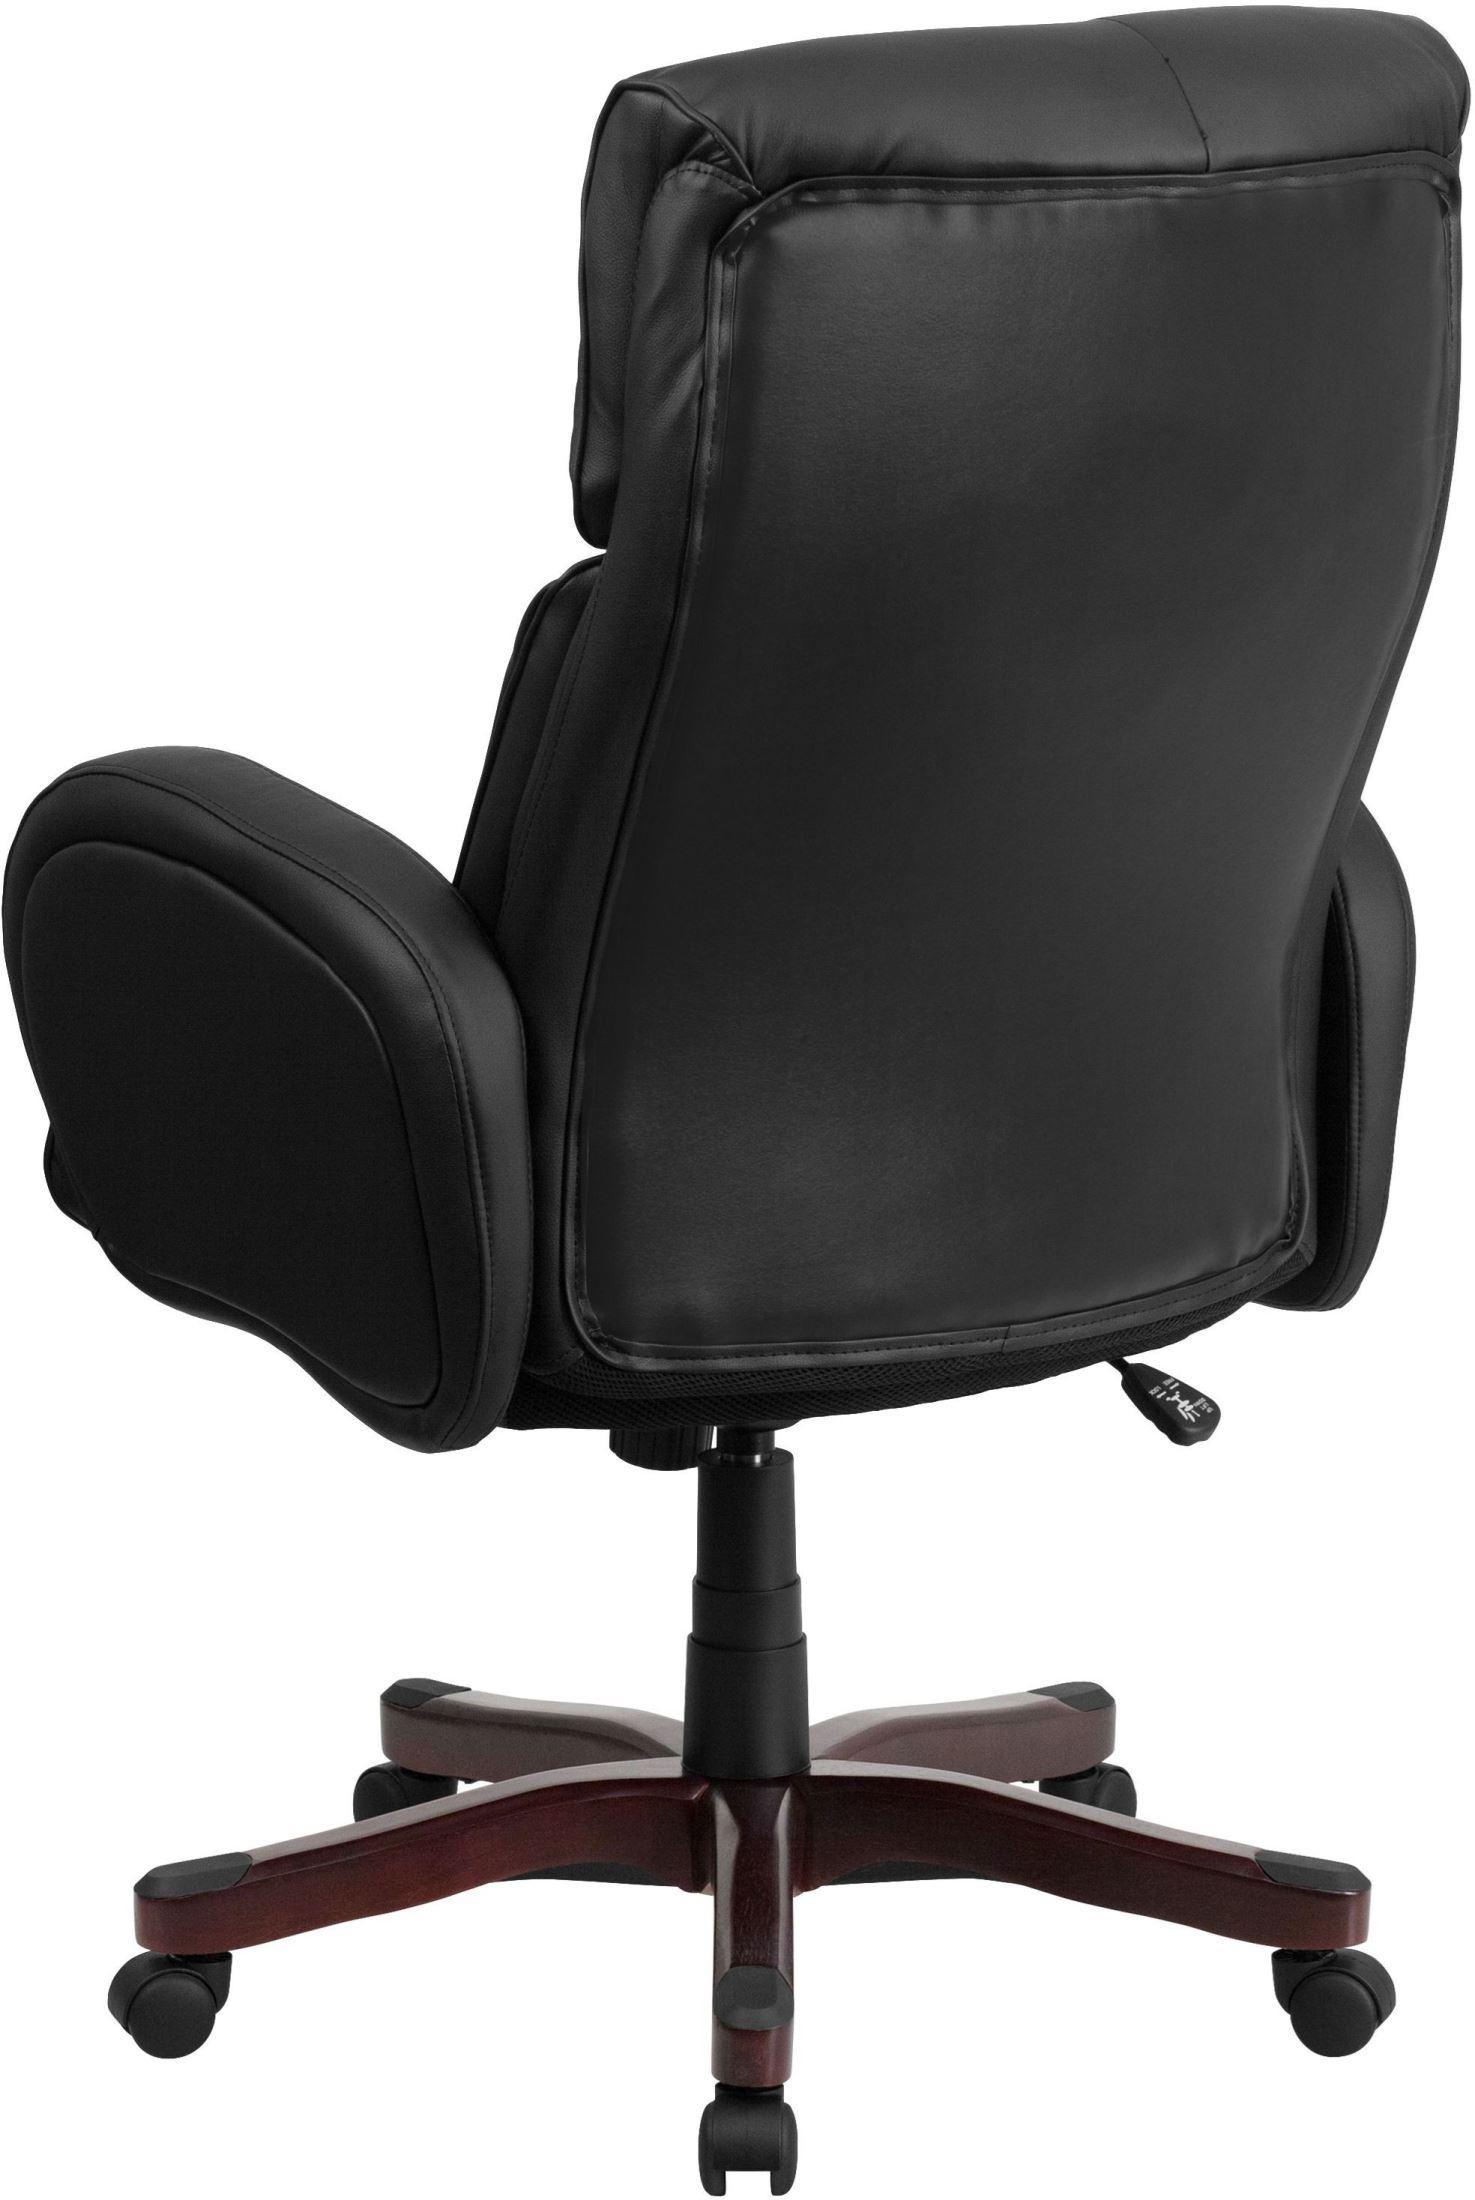 tall swivel chair design materials black executive office arm bt 9028h 1